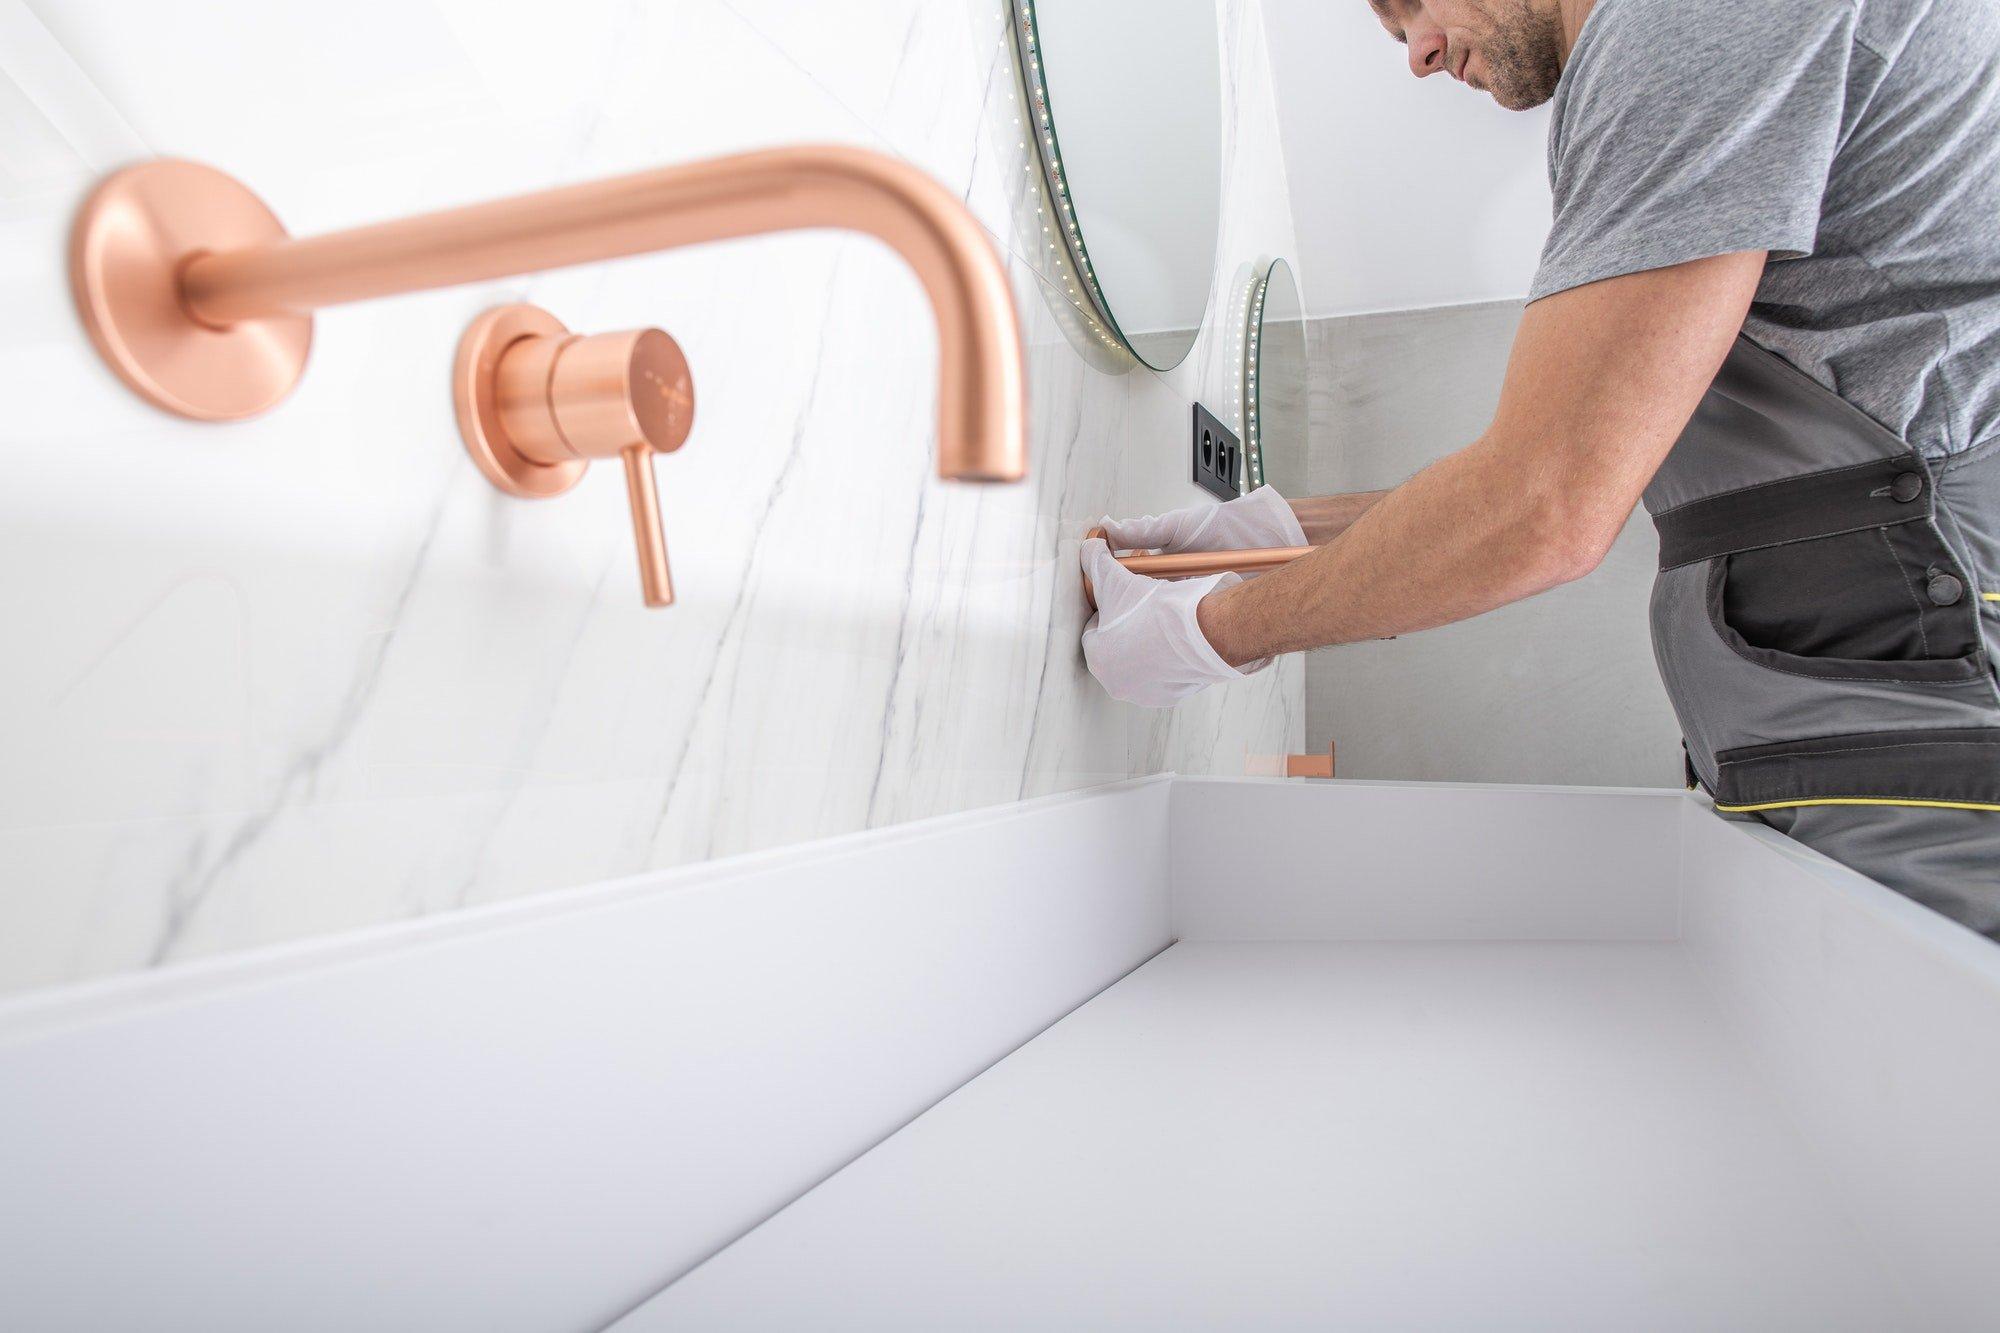 Copper Bathroom Facuet Installation By Handyman.